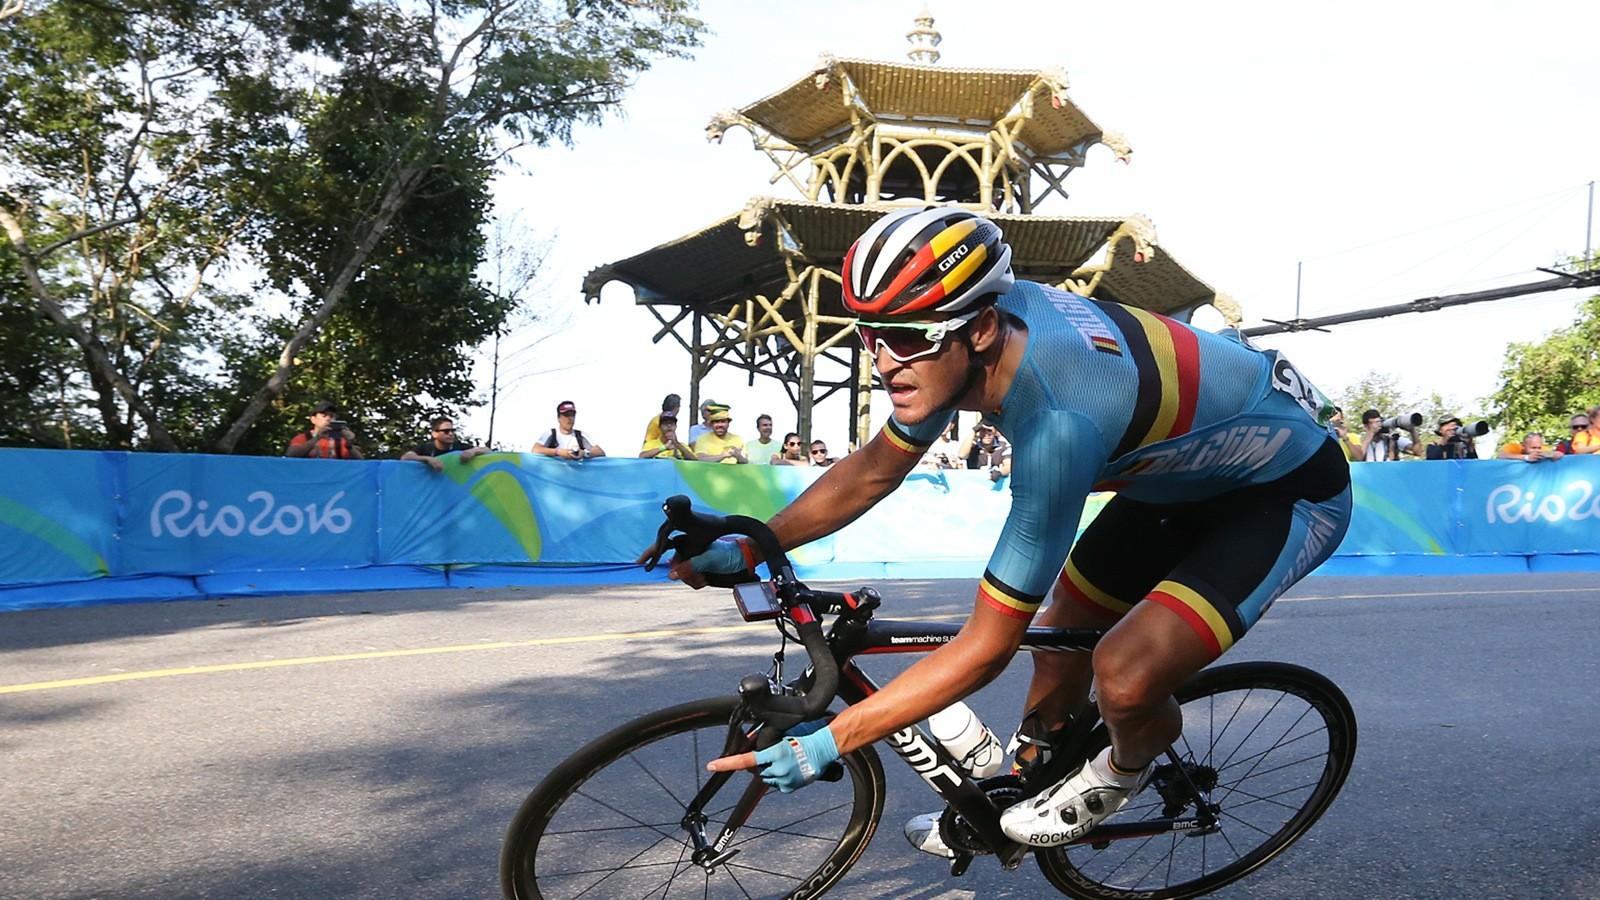 Greg Van Avermaet won the Olympic road race on a BMC...